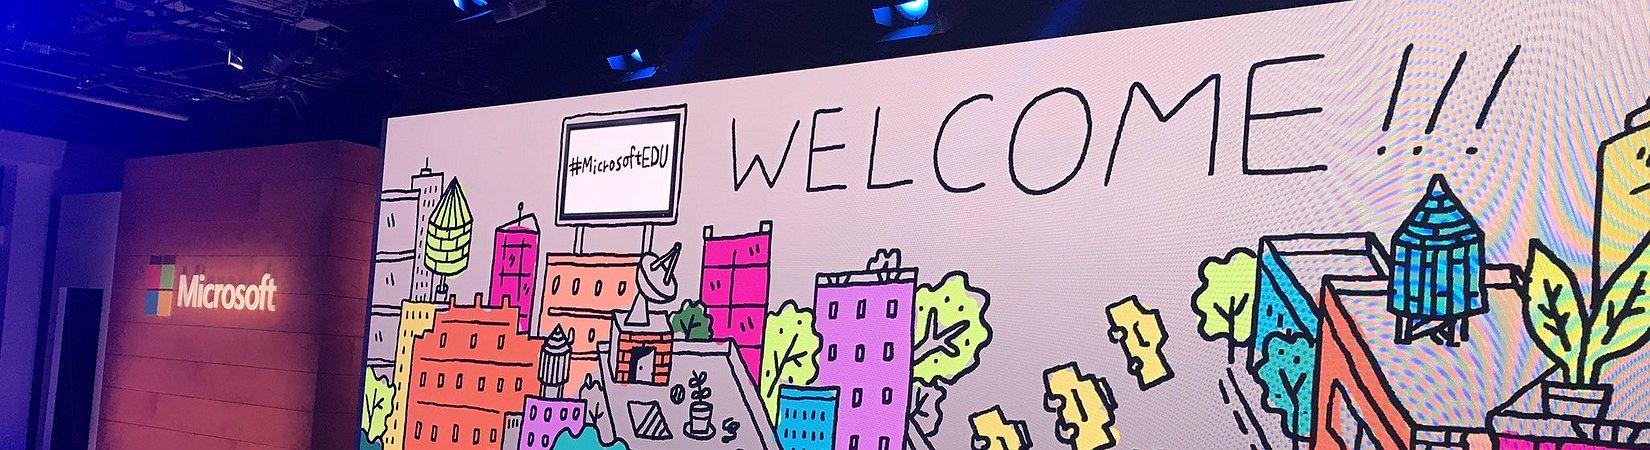 Презентация Microsoft: Что нового